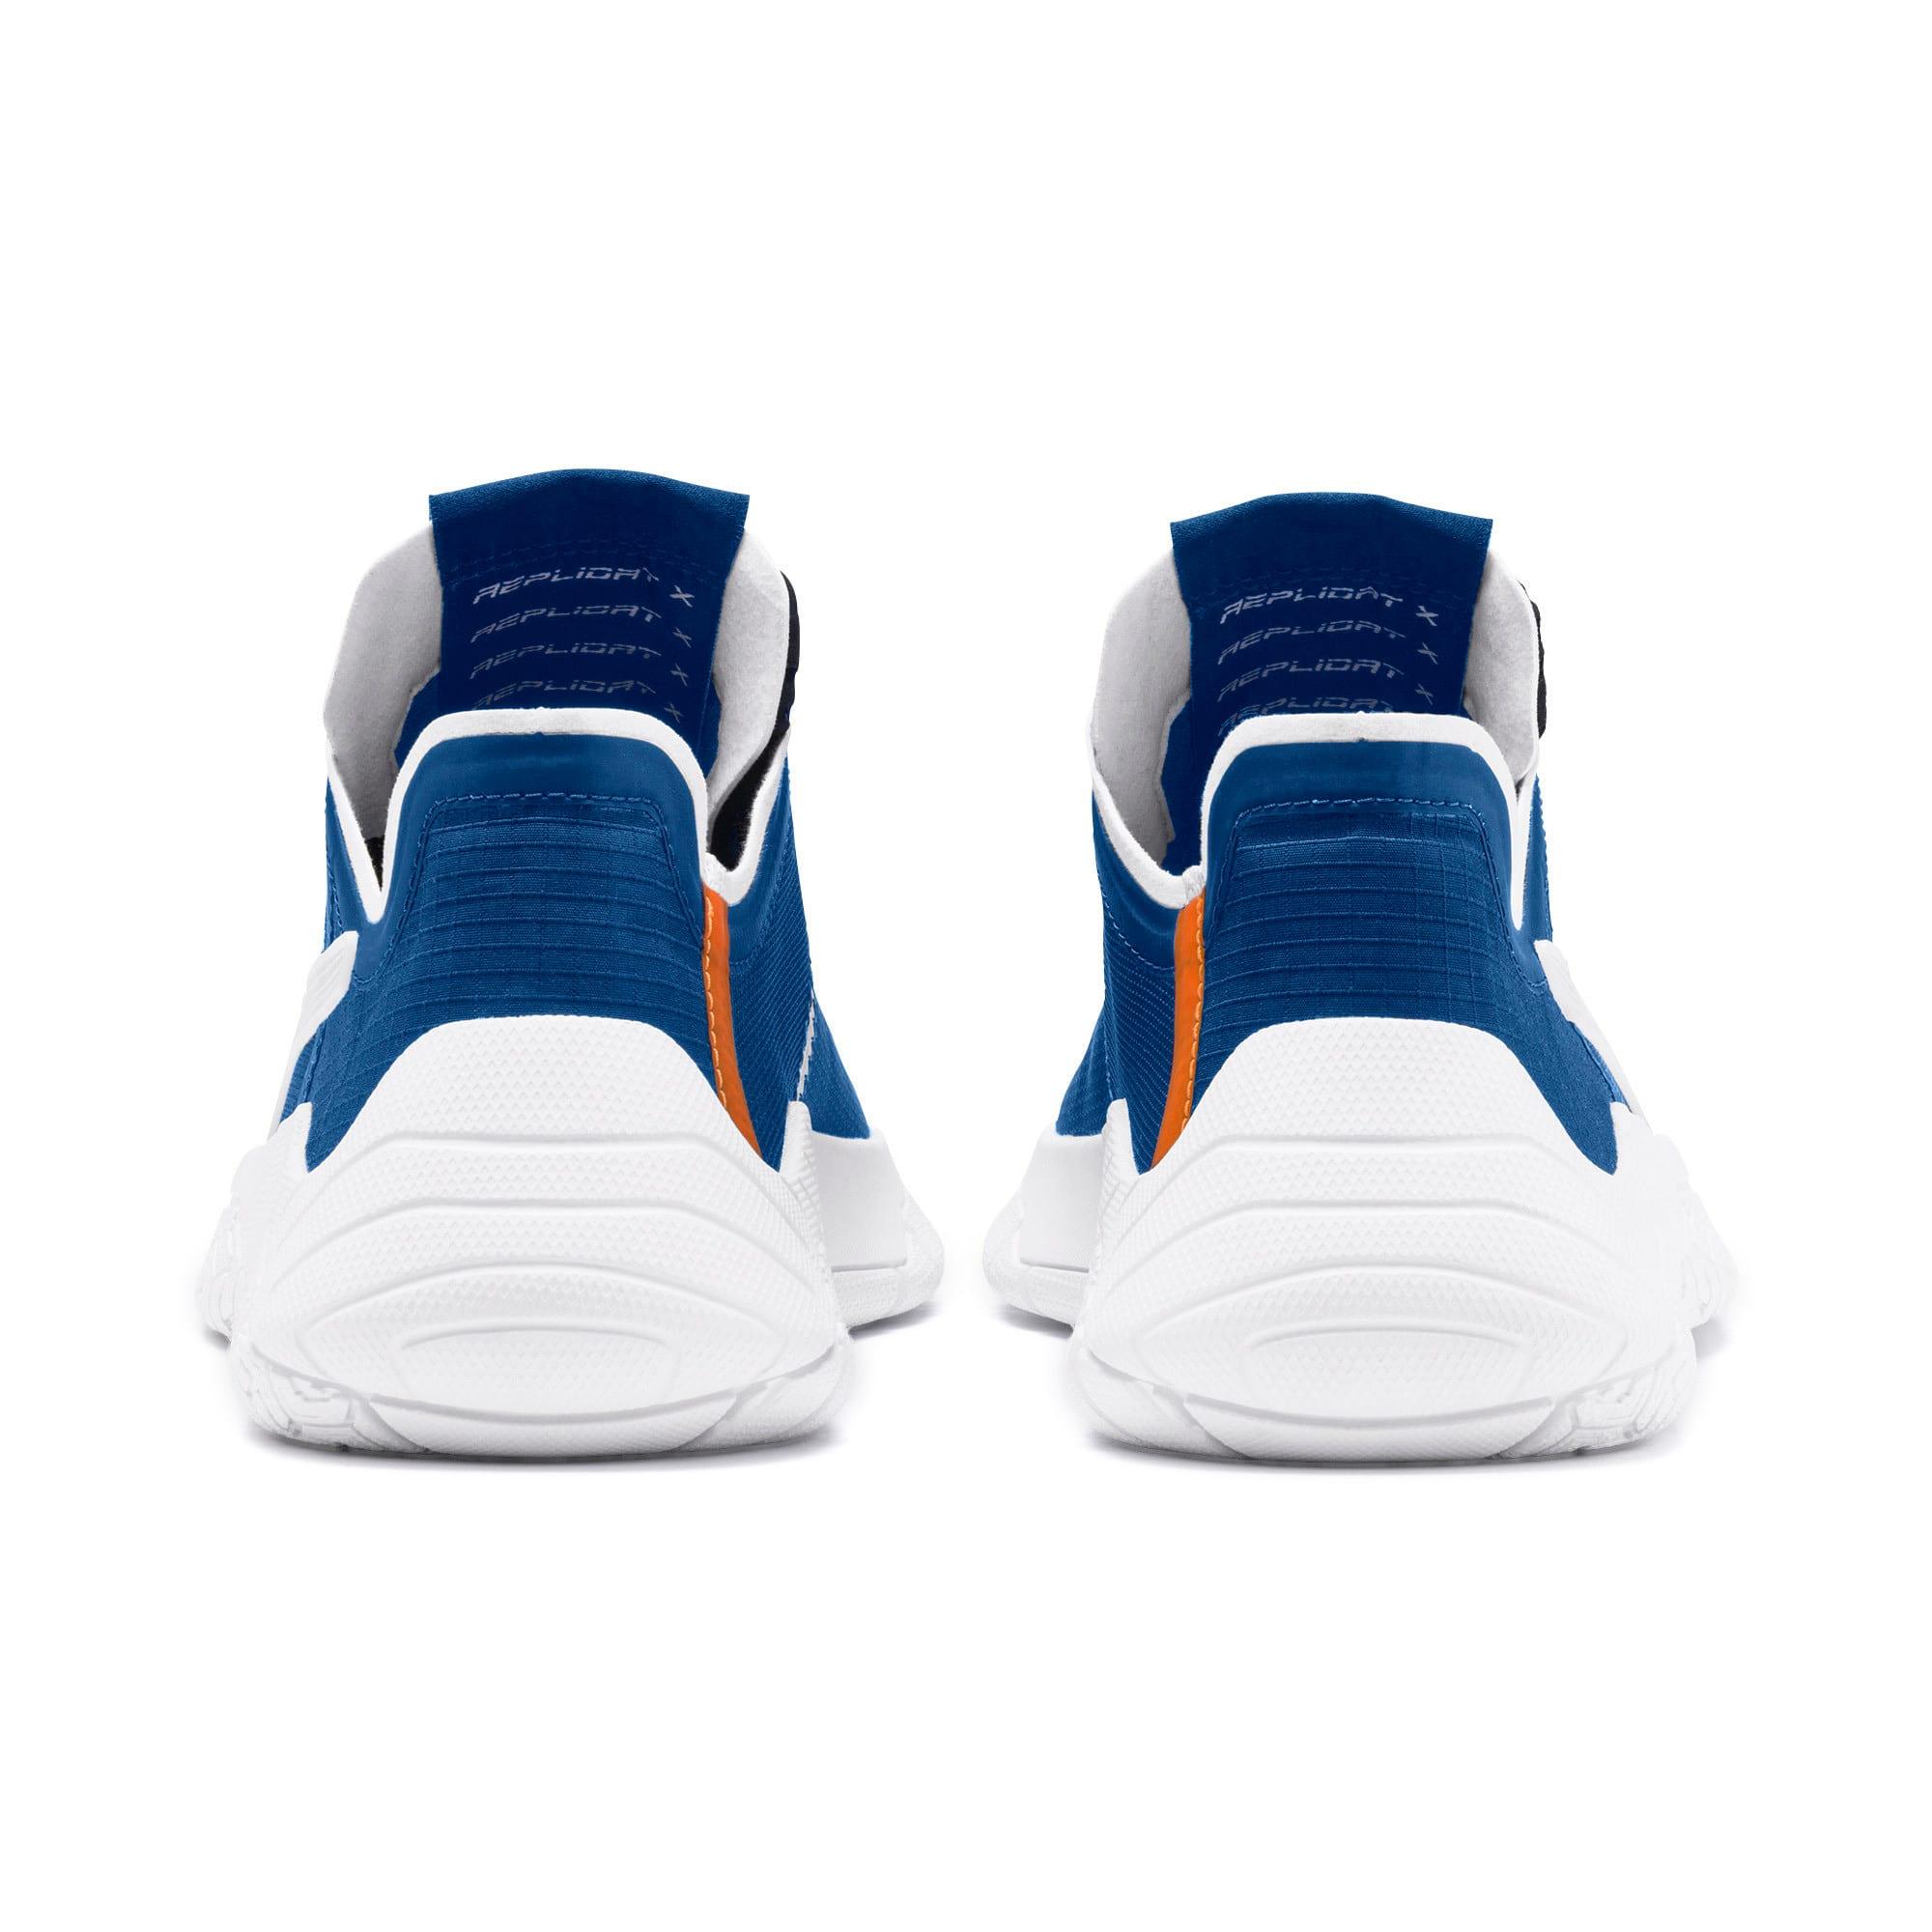 Thumbnail 3 of Replicat-X Circuit Motorsport Shoes, Galaxy Blue-Puma White, medium